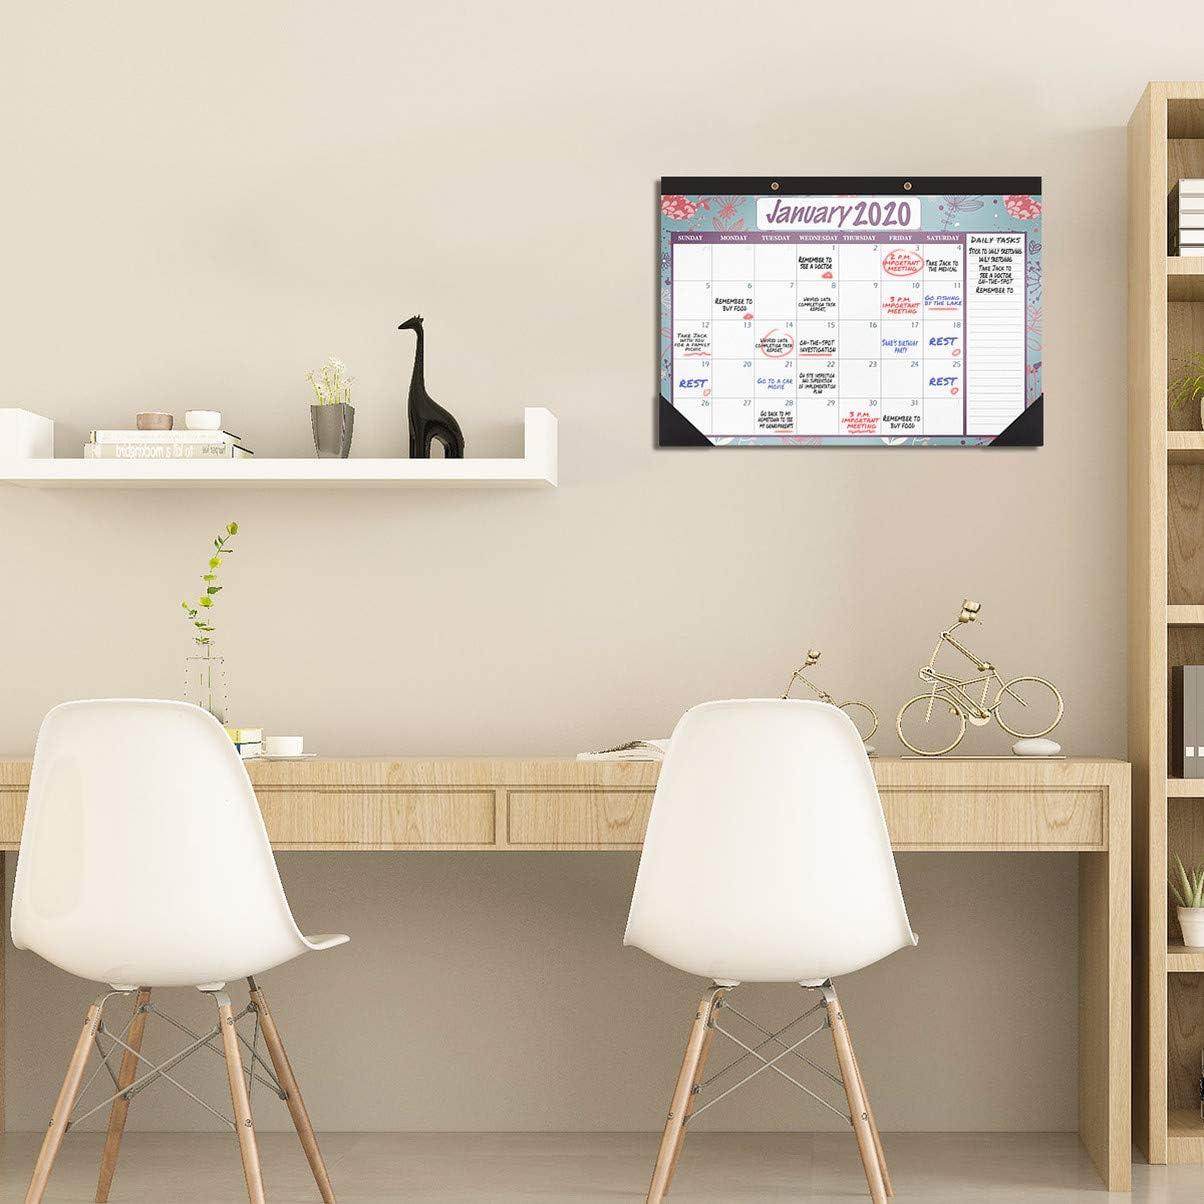 Desktop Wall Calendar for Office Home Daily Schedule Planner STOBOK 2020-2021 Year Monthly Desk Pad Calendar